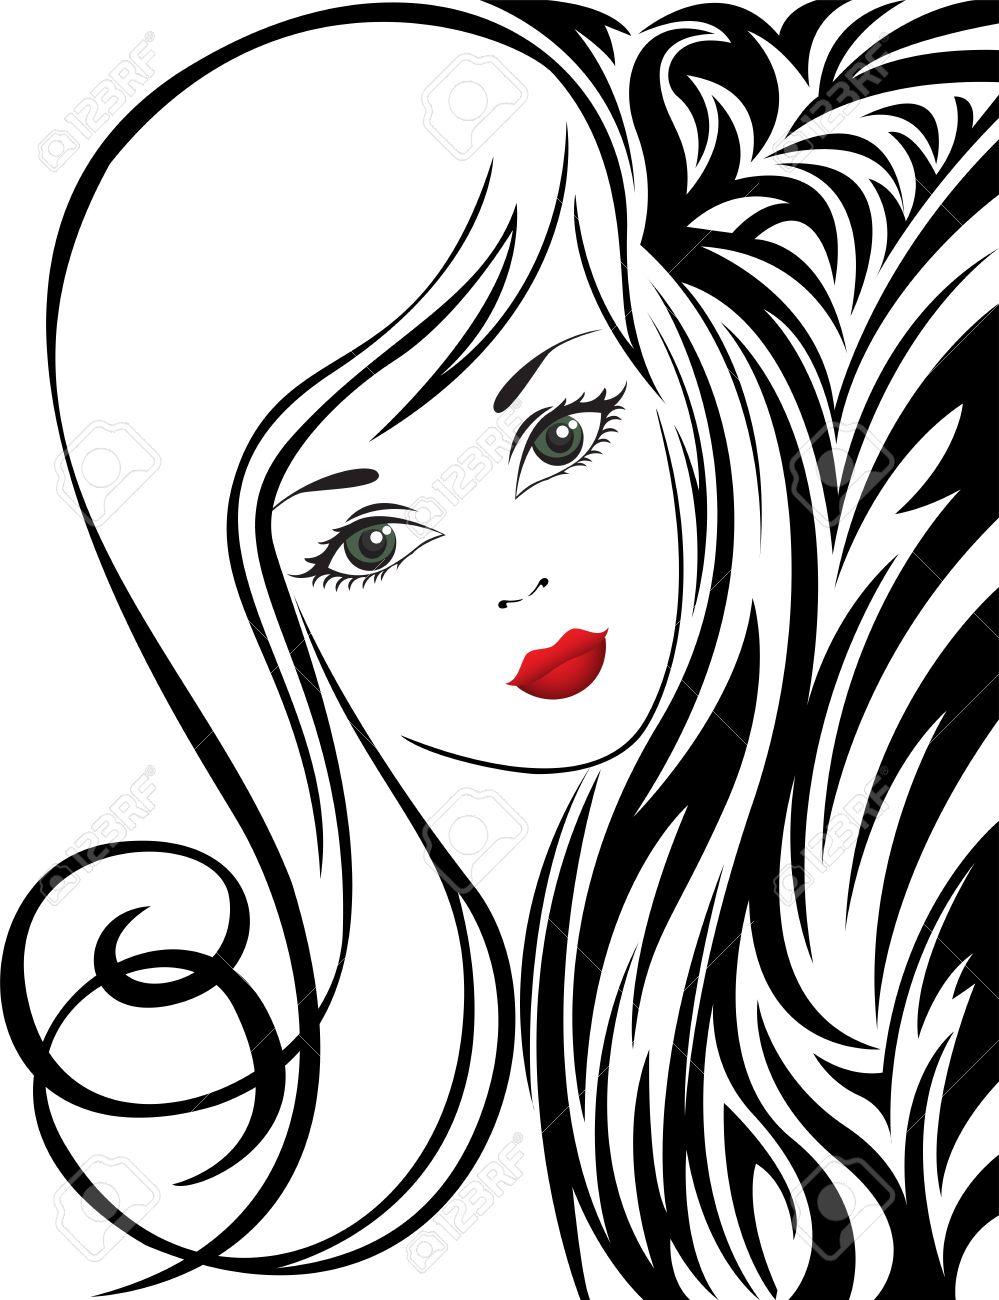 Arte Abstracto Facil Para Dibujar Blanco Y Negro. Puntea Cada Centro ...